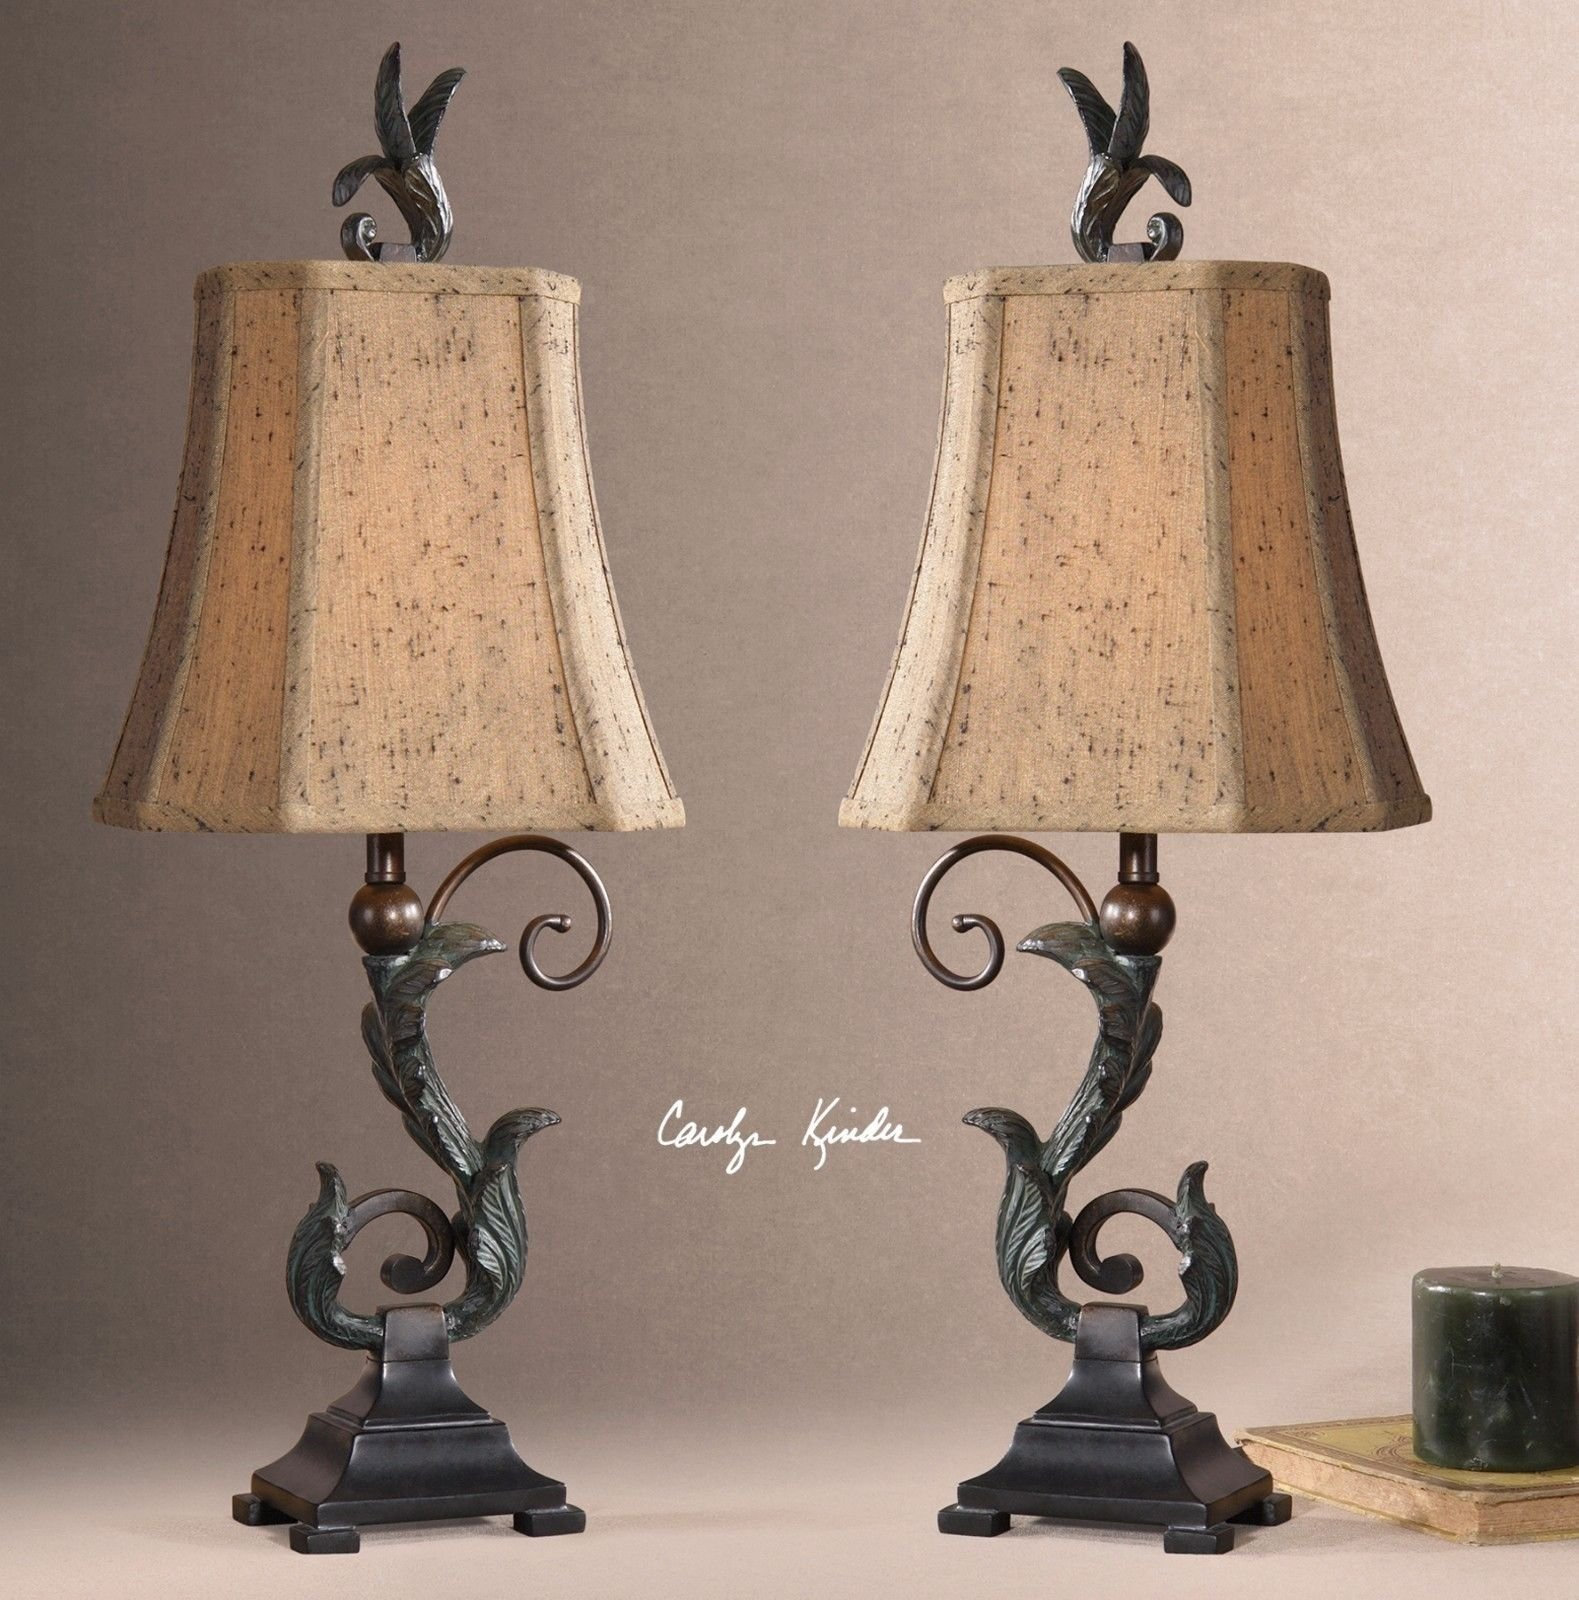 Uttermost Caperana Black Buffet Lamps Set/2 ..(from#_vaasuhomes_152322168957239 by Jonyandwater